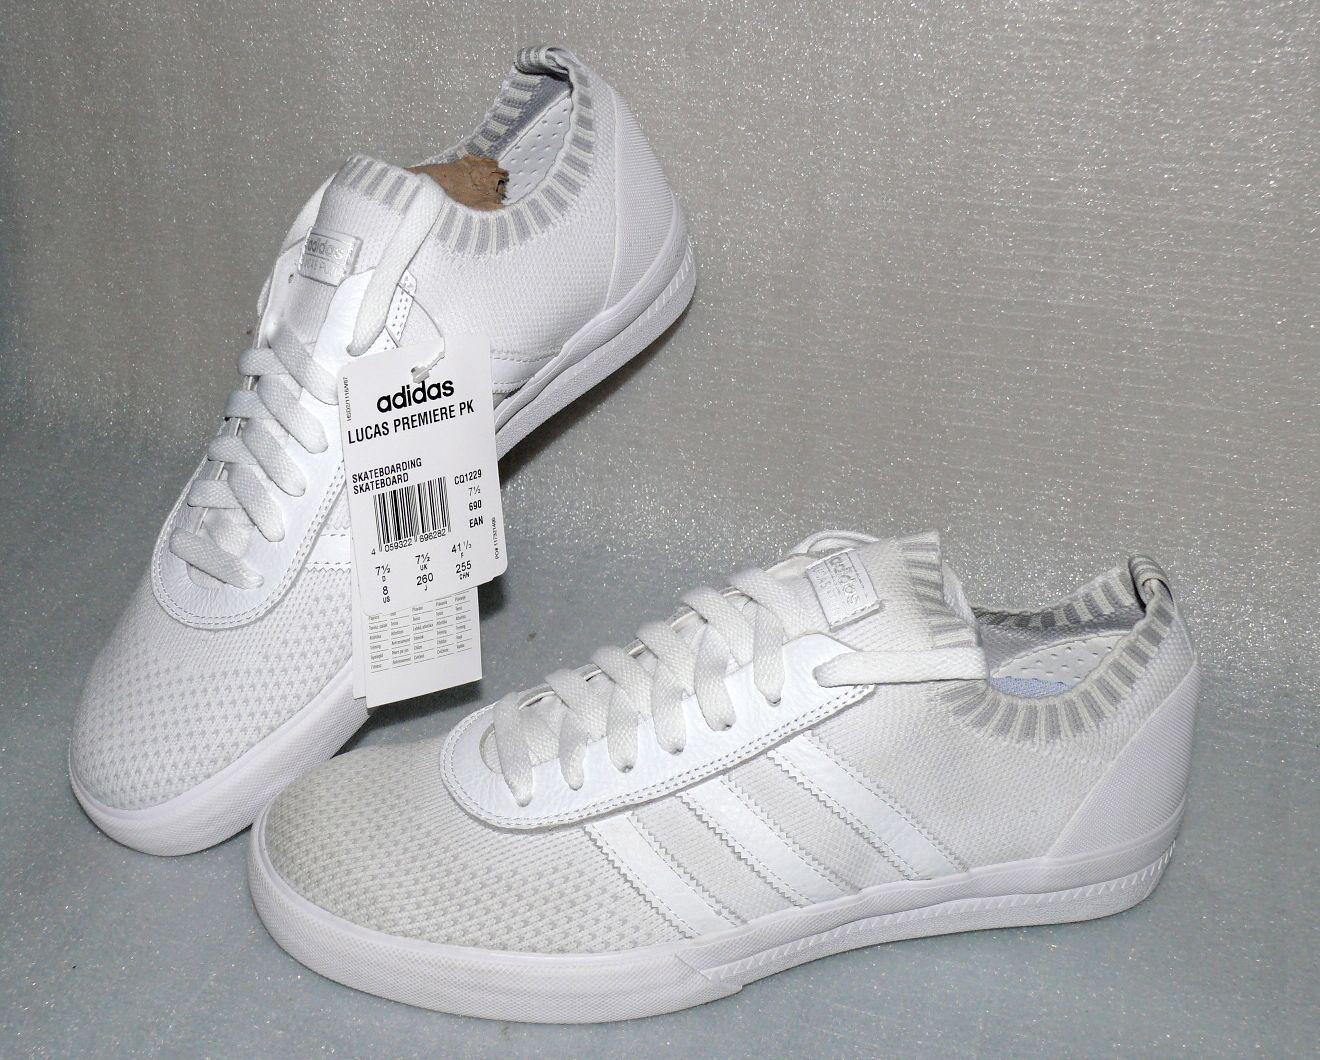 Adidas Lucas Premiere PK CQ1229 Herren Schuhe LOauf Running